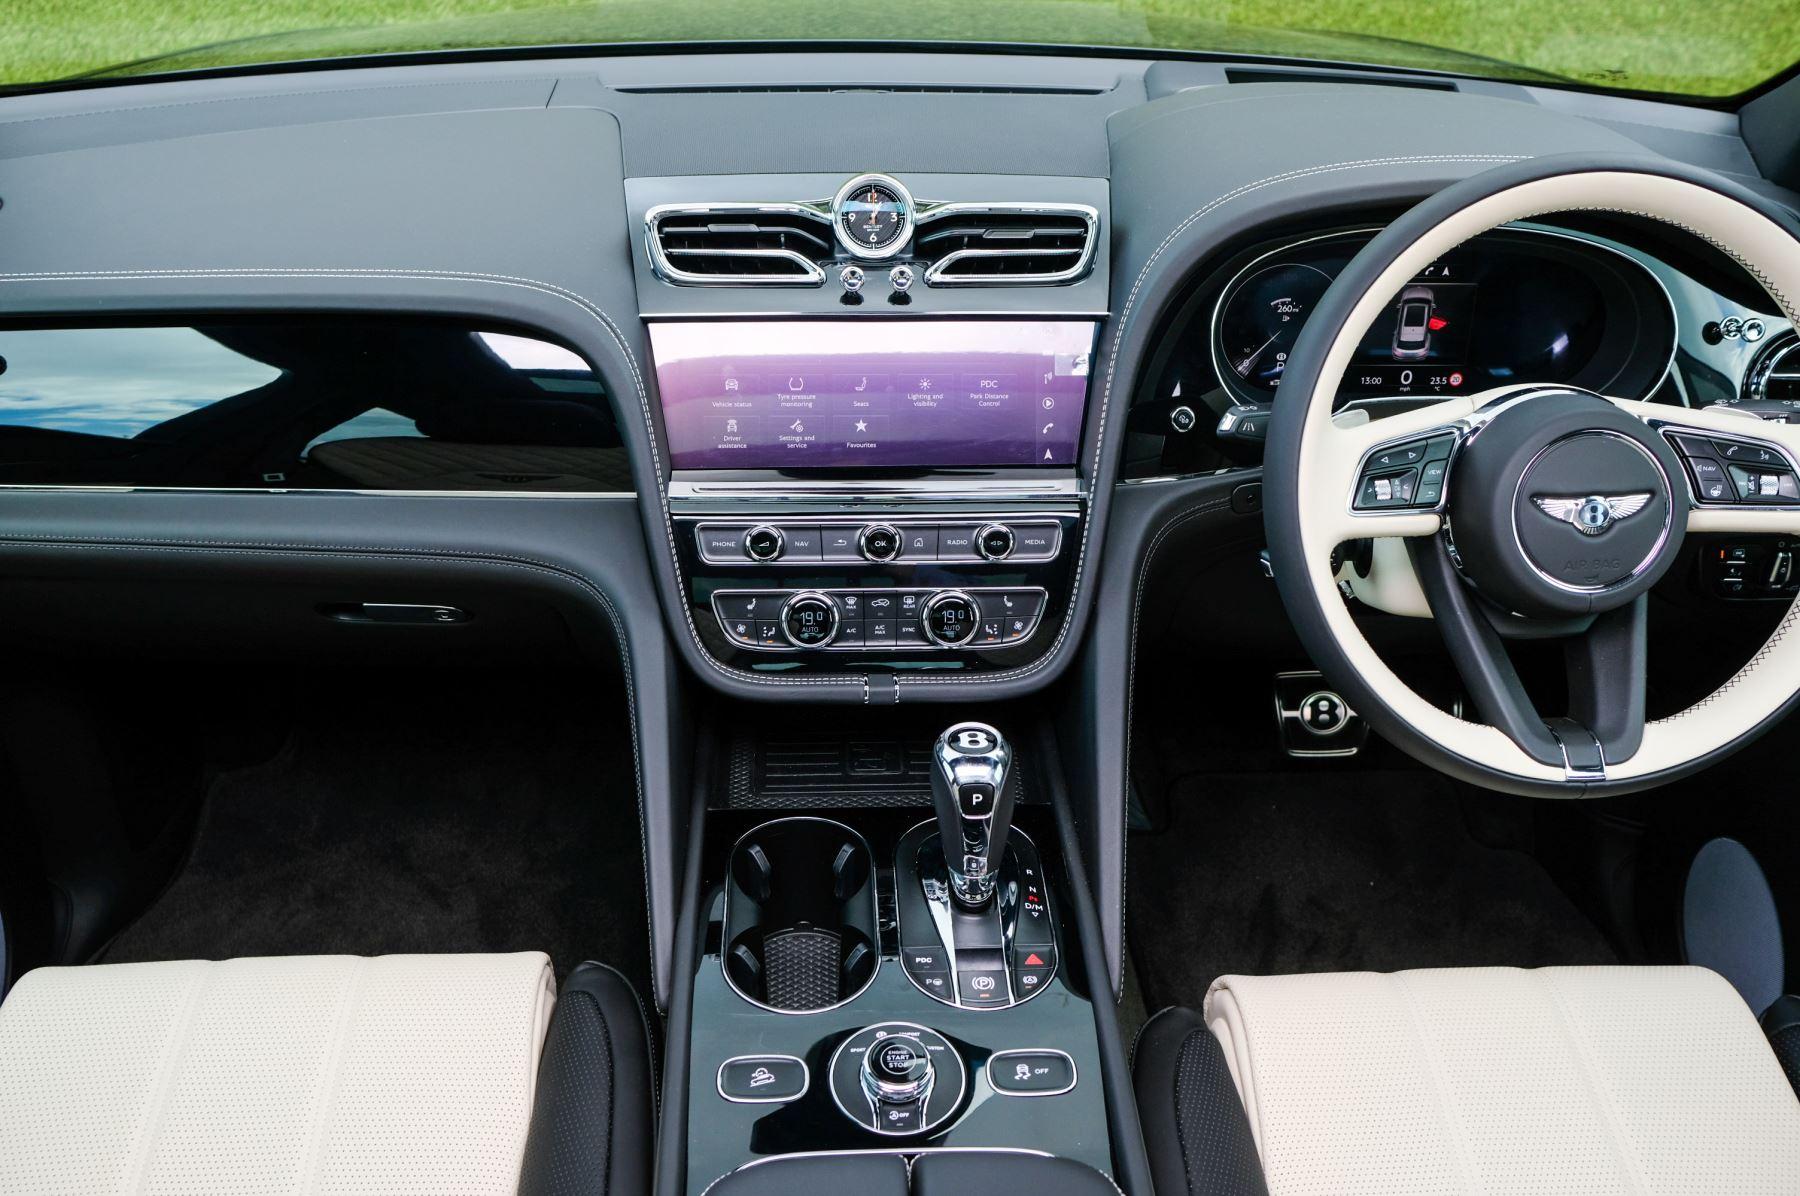 Bentley Bentayga 4.0 V8 - Mulliner Driving Specification for Black Specification image 15